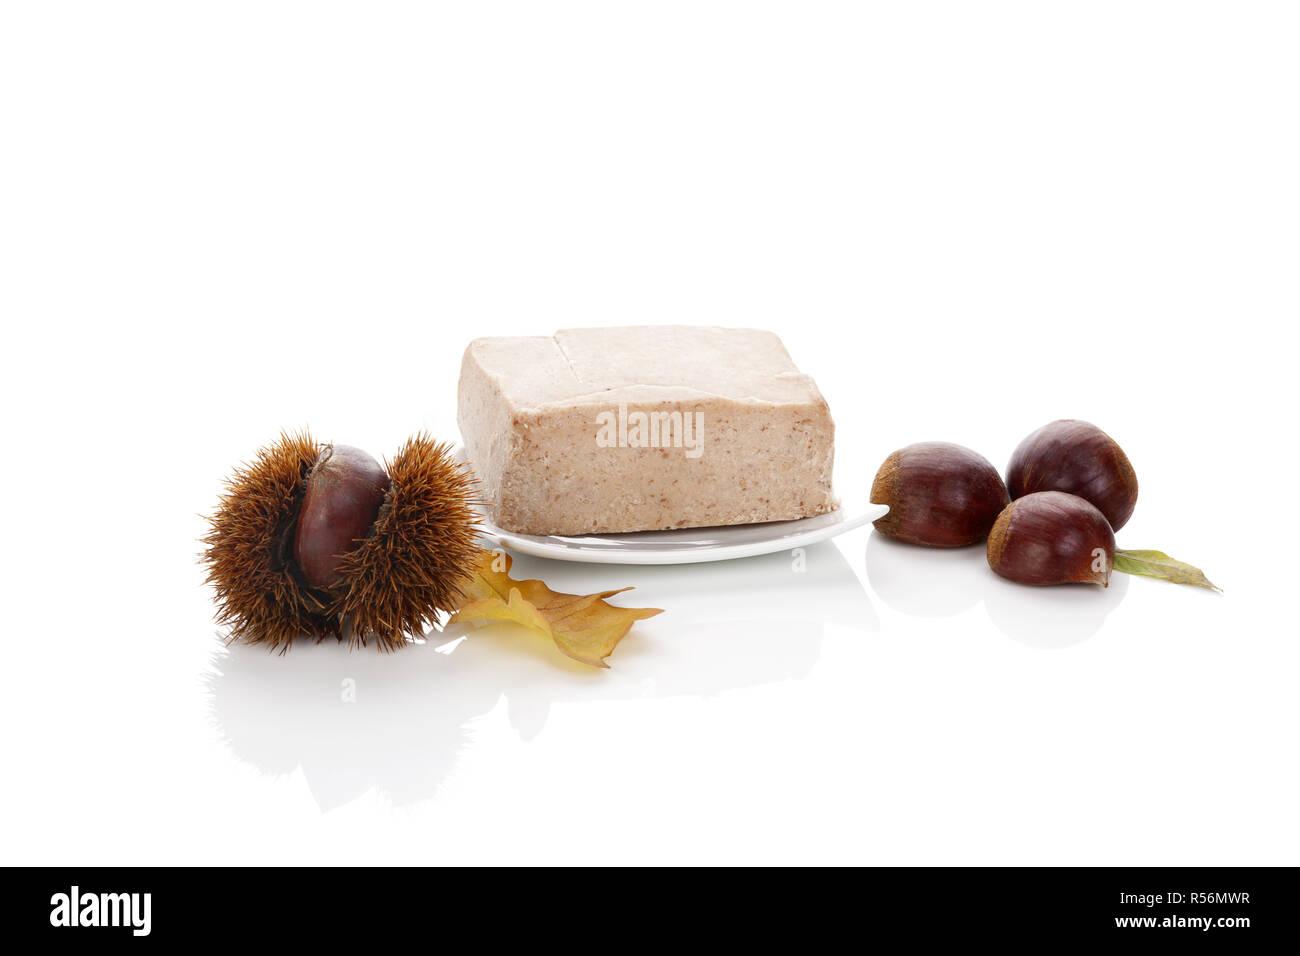 Chestnut puree isolated. - Stock Image